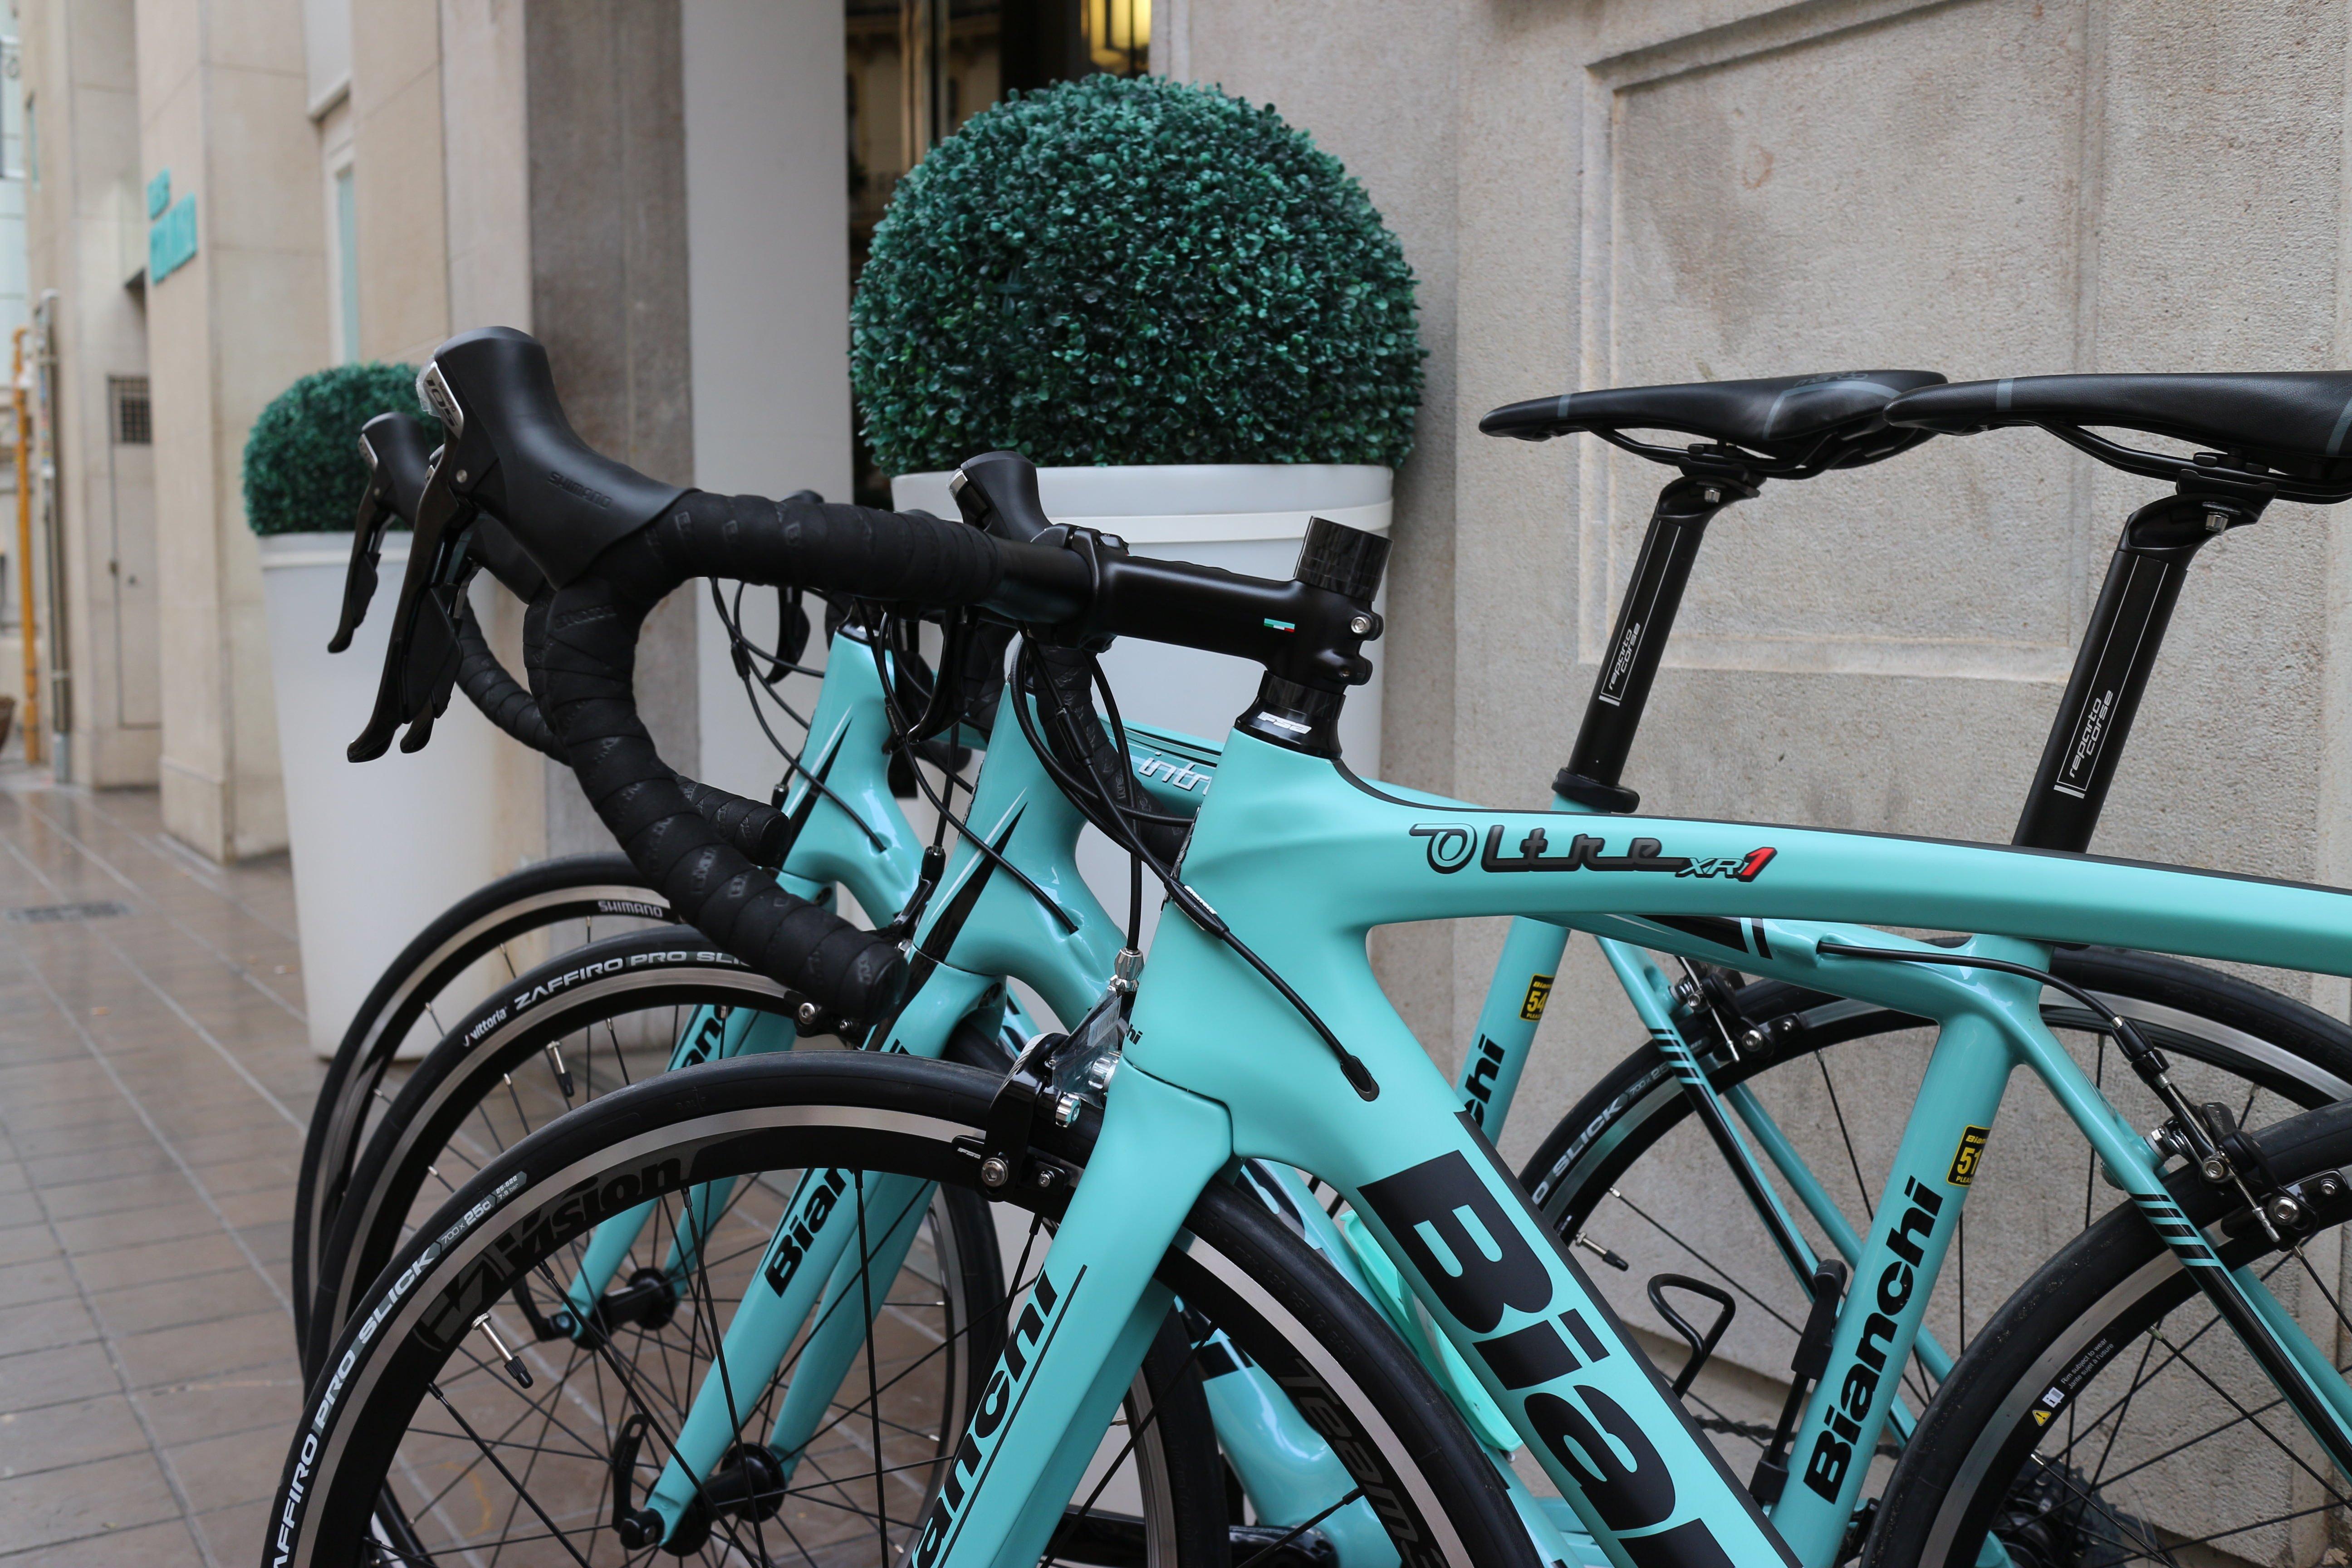 alquiler bicicletas carretera startbikevalencia